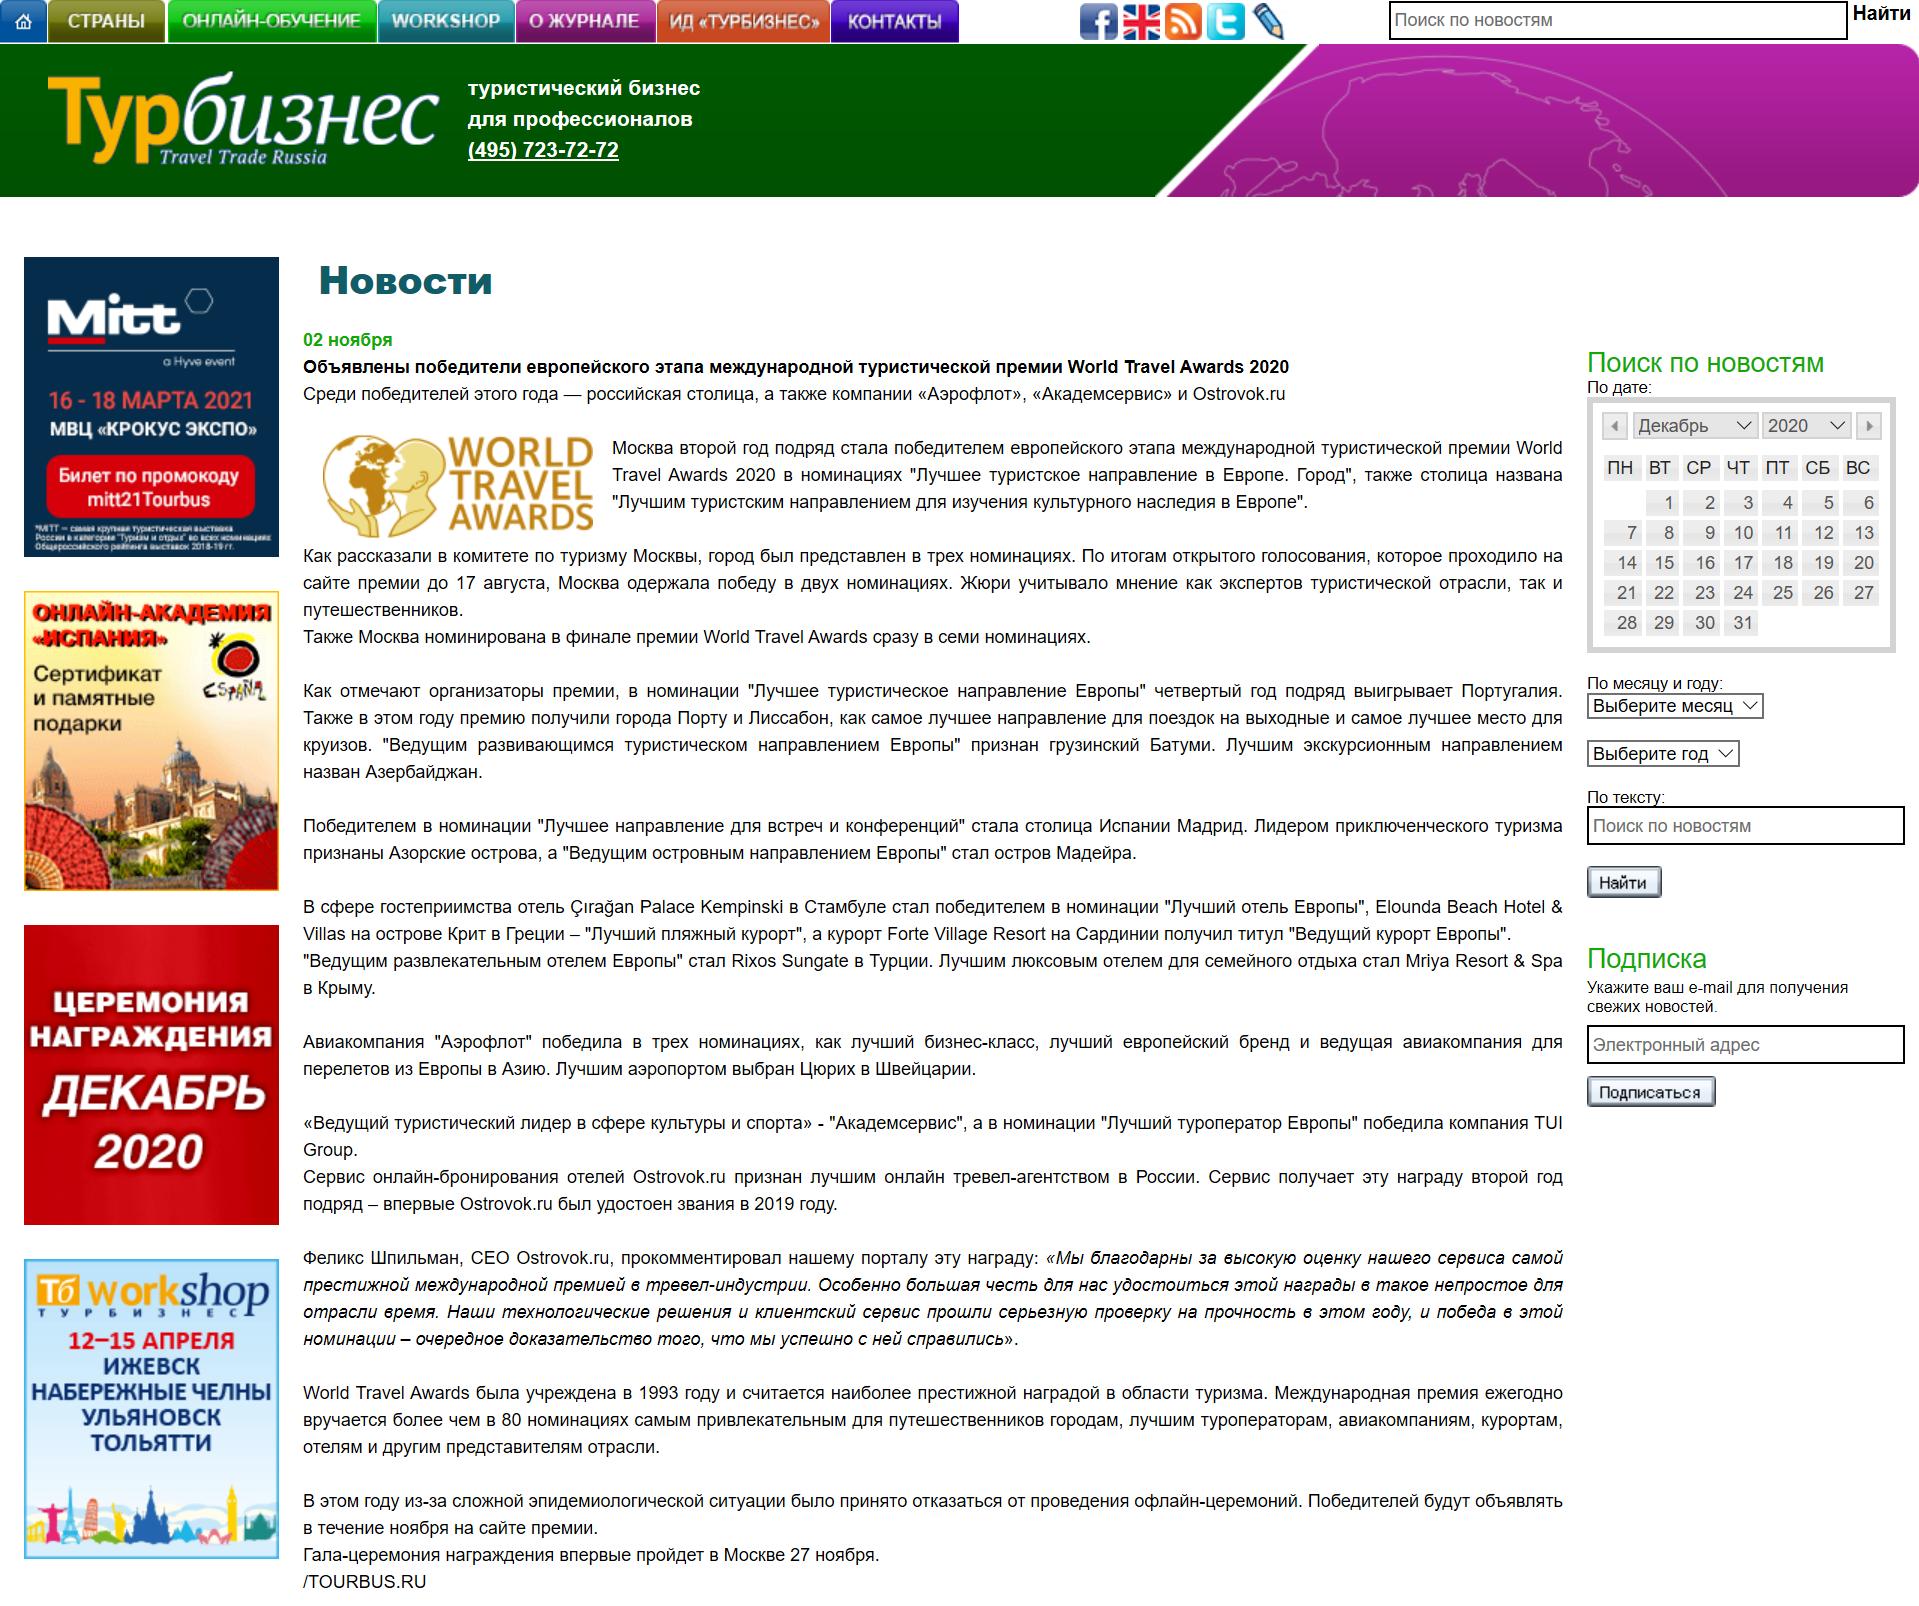 «Турбизнес», www.tourbus.ru, 02.11.2020